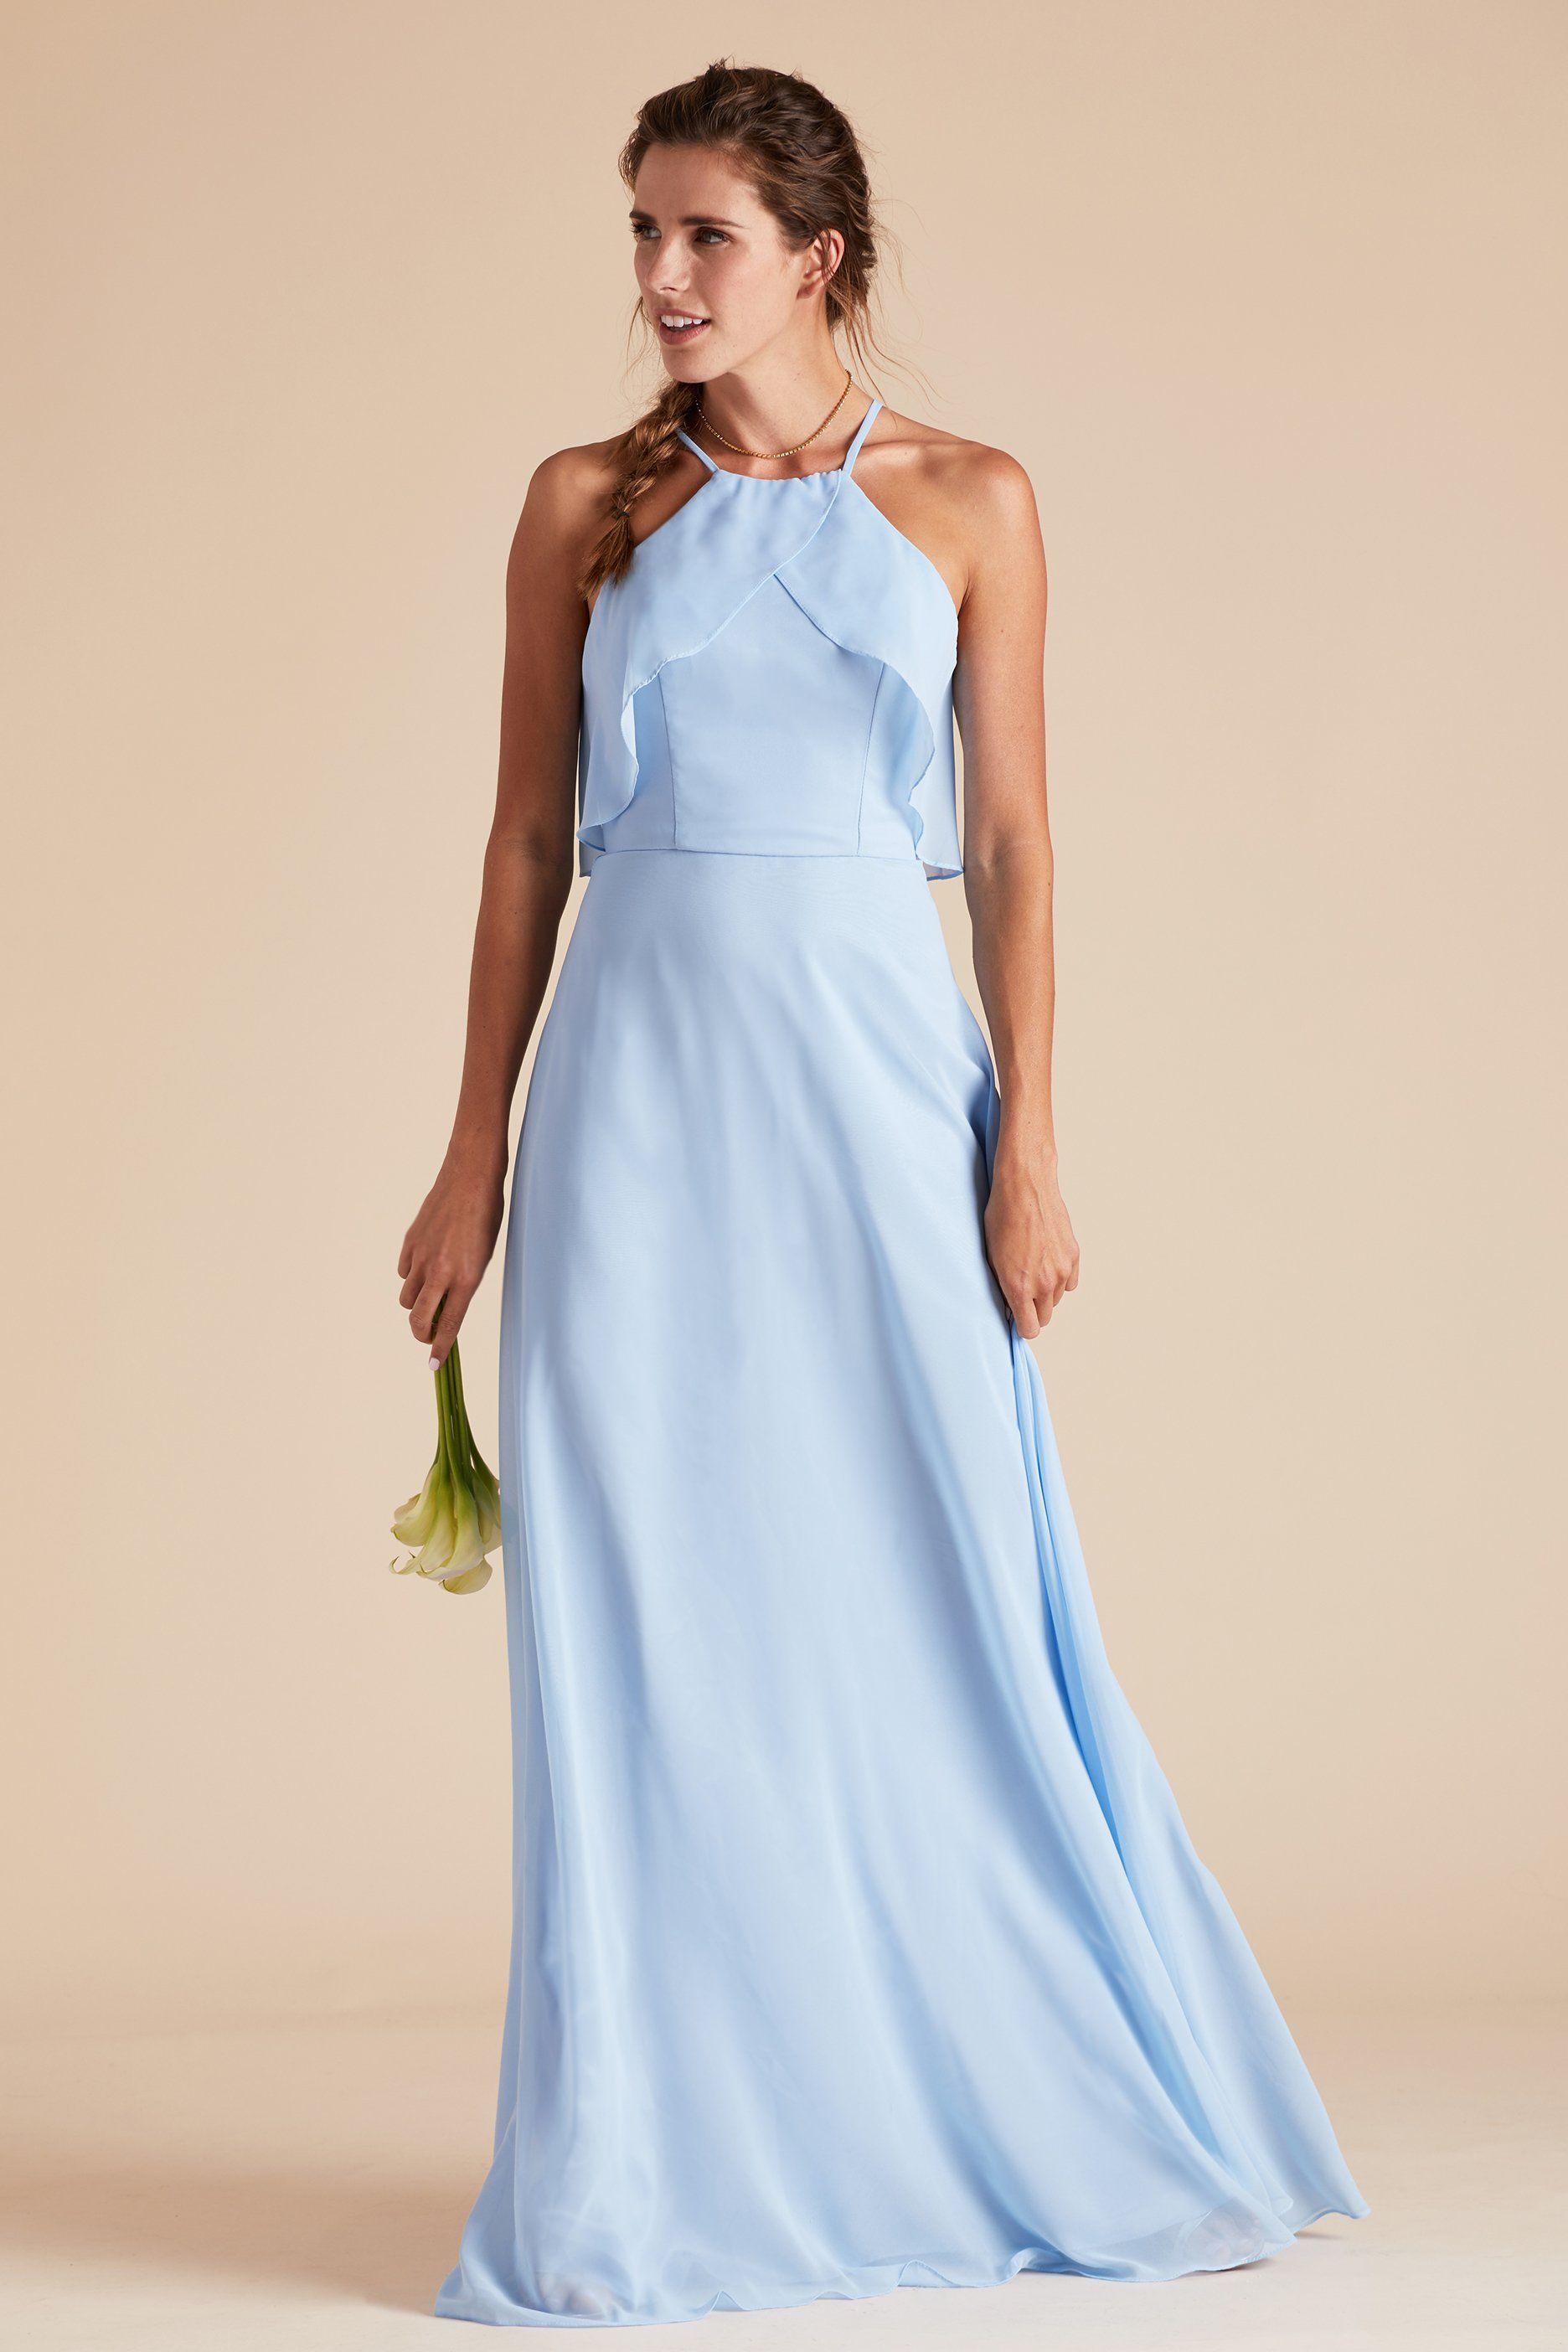 getting lighting dresses photos light said she wedding bridesmaid ready pin blue dressed day